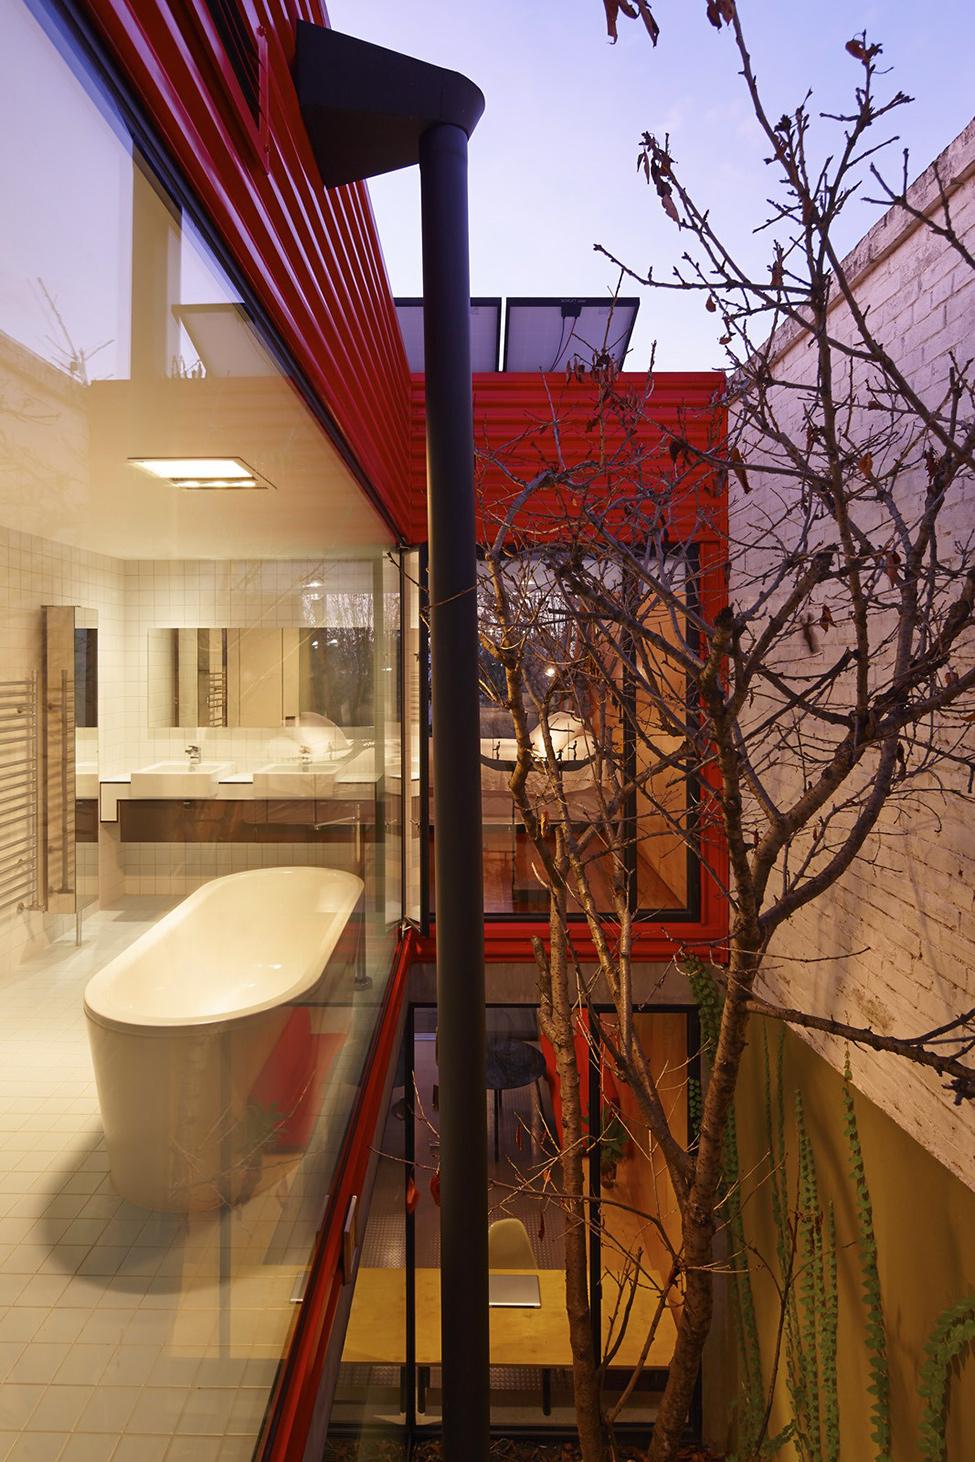 renovate classic to modern townhome australia (2)